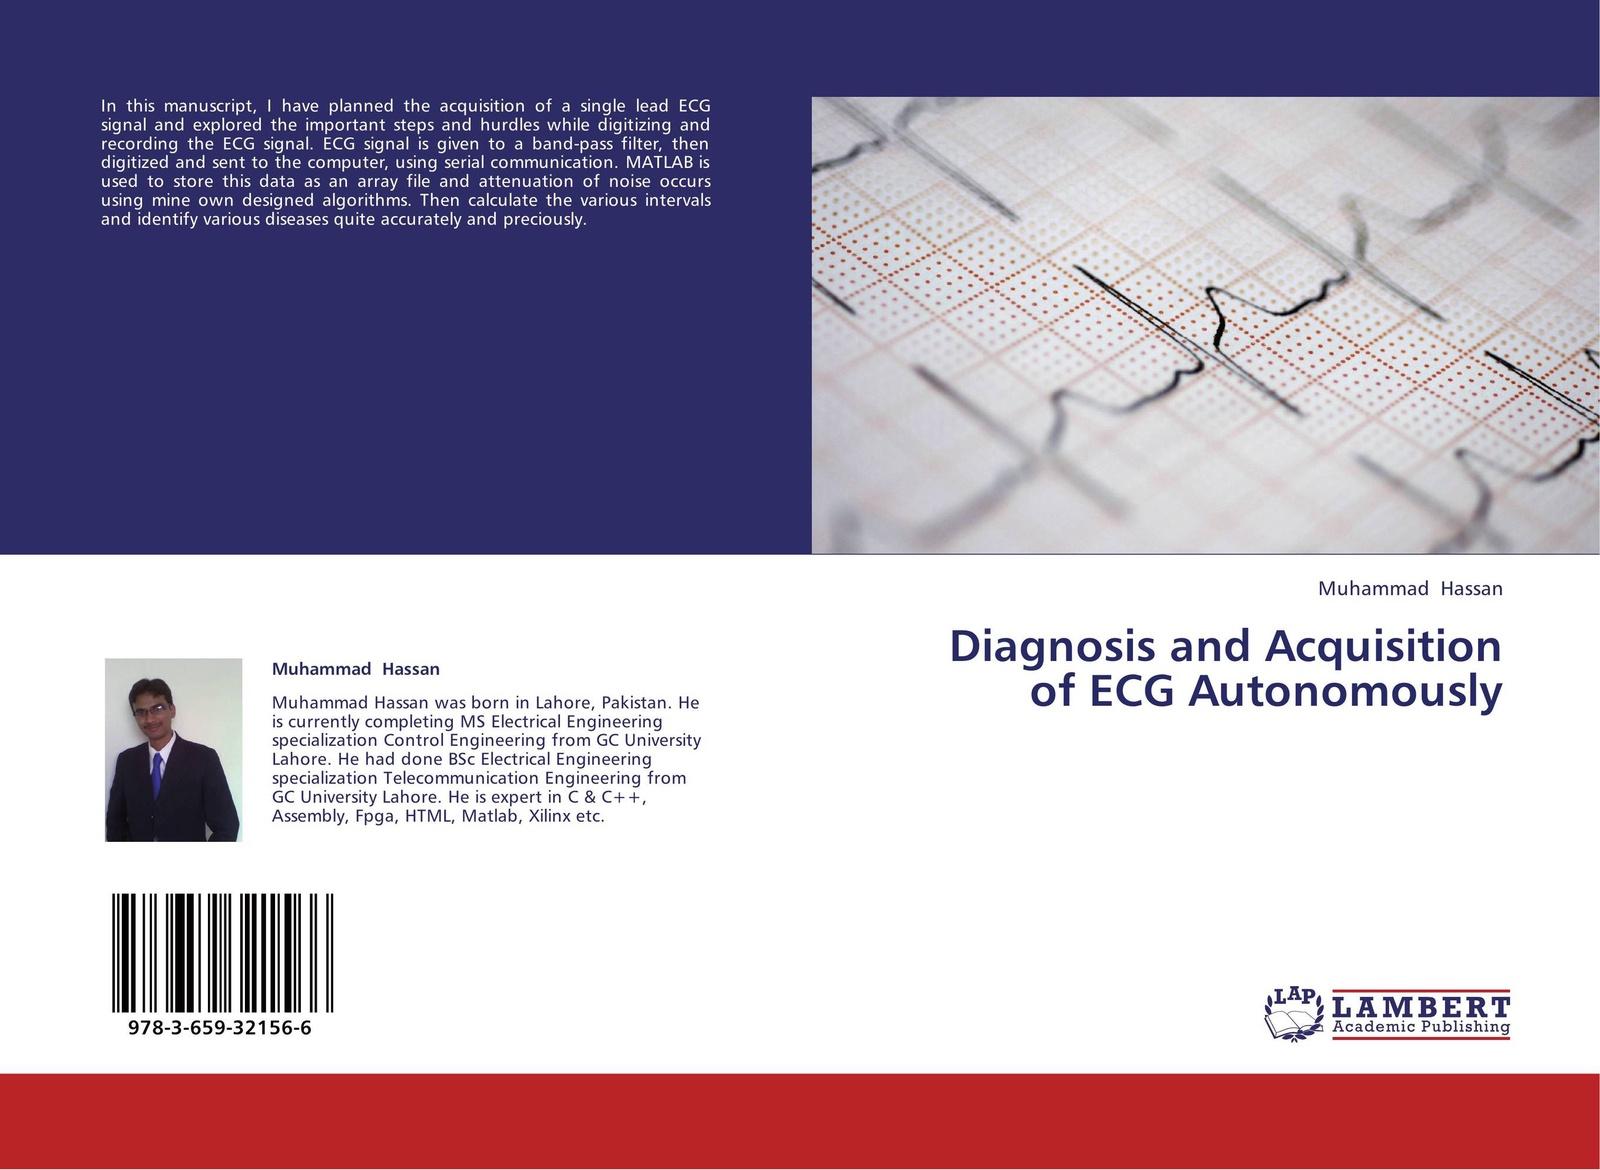 Muhammad Hassan Diagnosis and Acquisition of ECG Autonomously нордавинд ecg dongle кардиофлешка